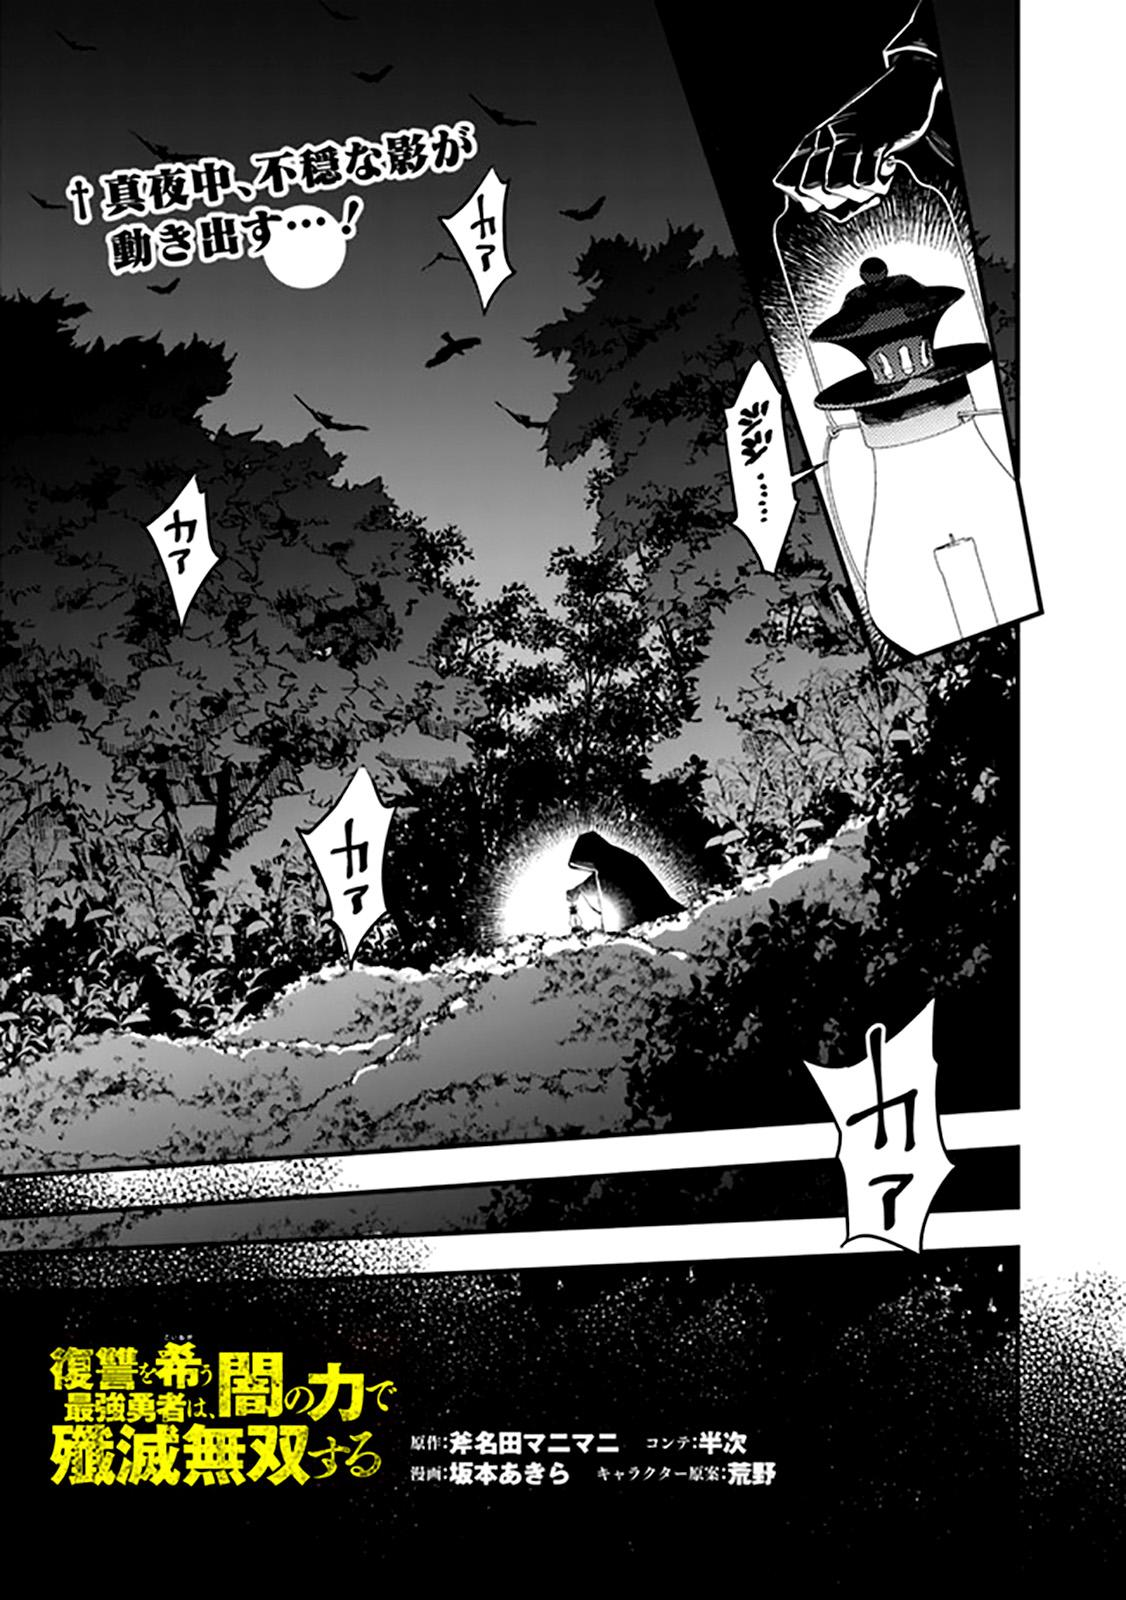 https://manga.mangadogs.com/comics/pic4/0/26176/1726342/558819aae187a240cf50cf81b10ad1e3.jpg Page 1